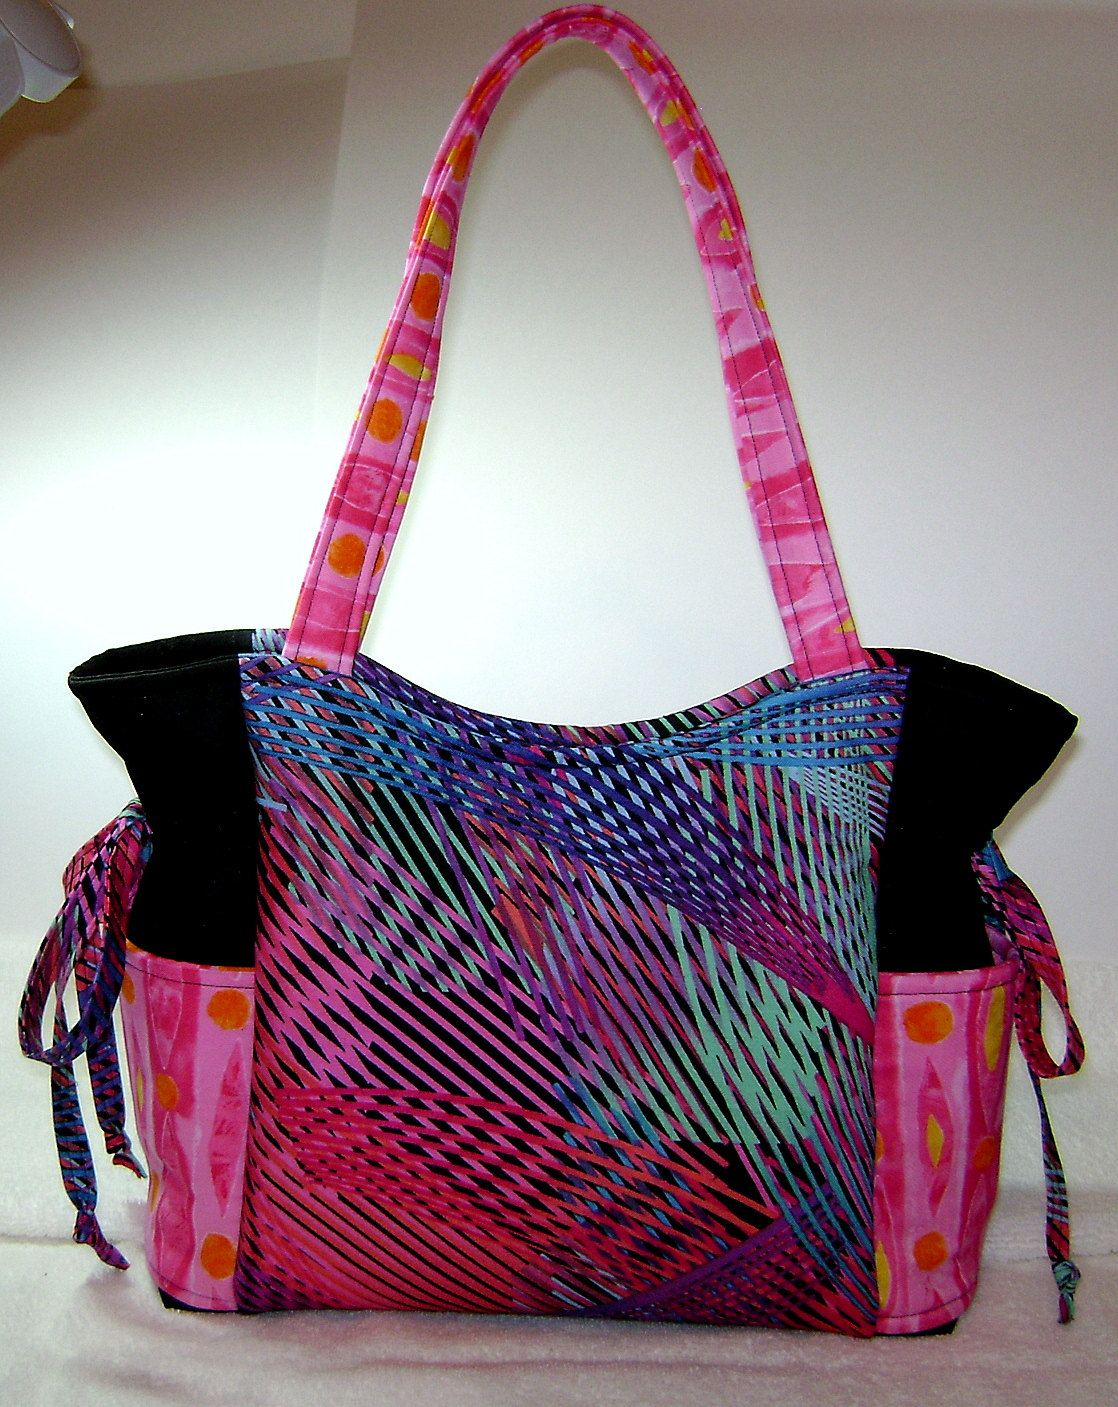 Handmade Purses Purse Handbag Fabric Medium Artsy Hp2